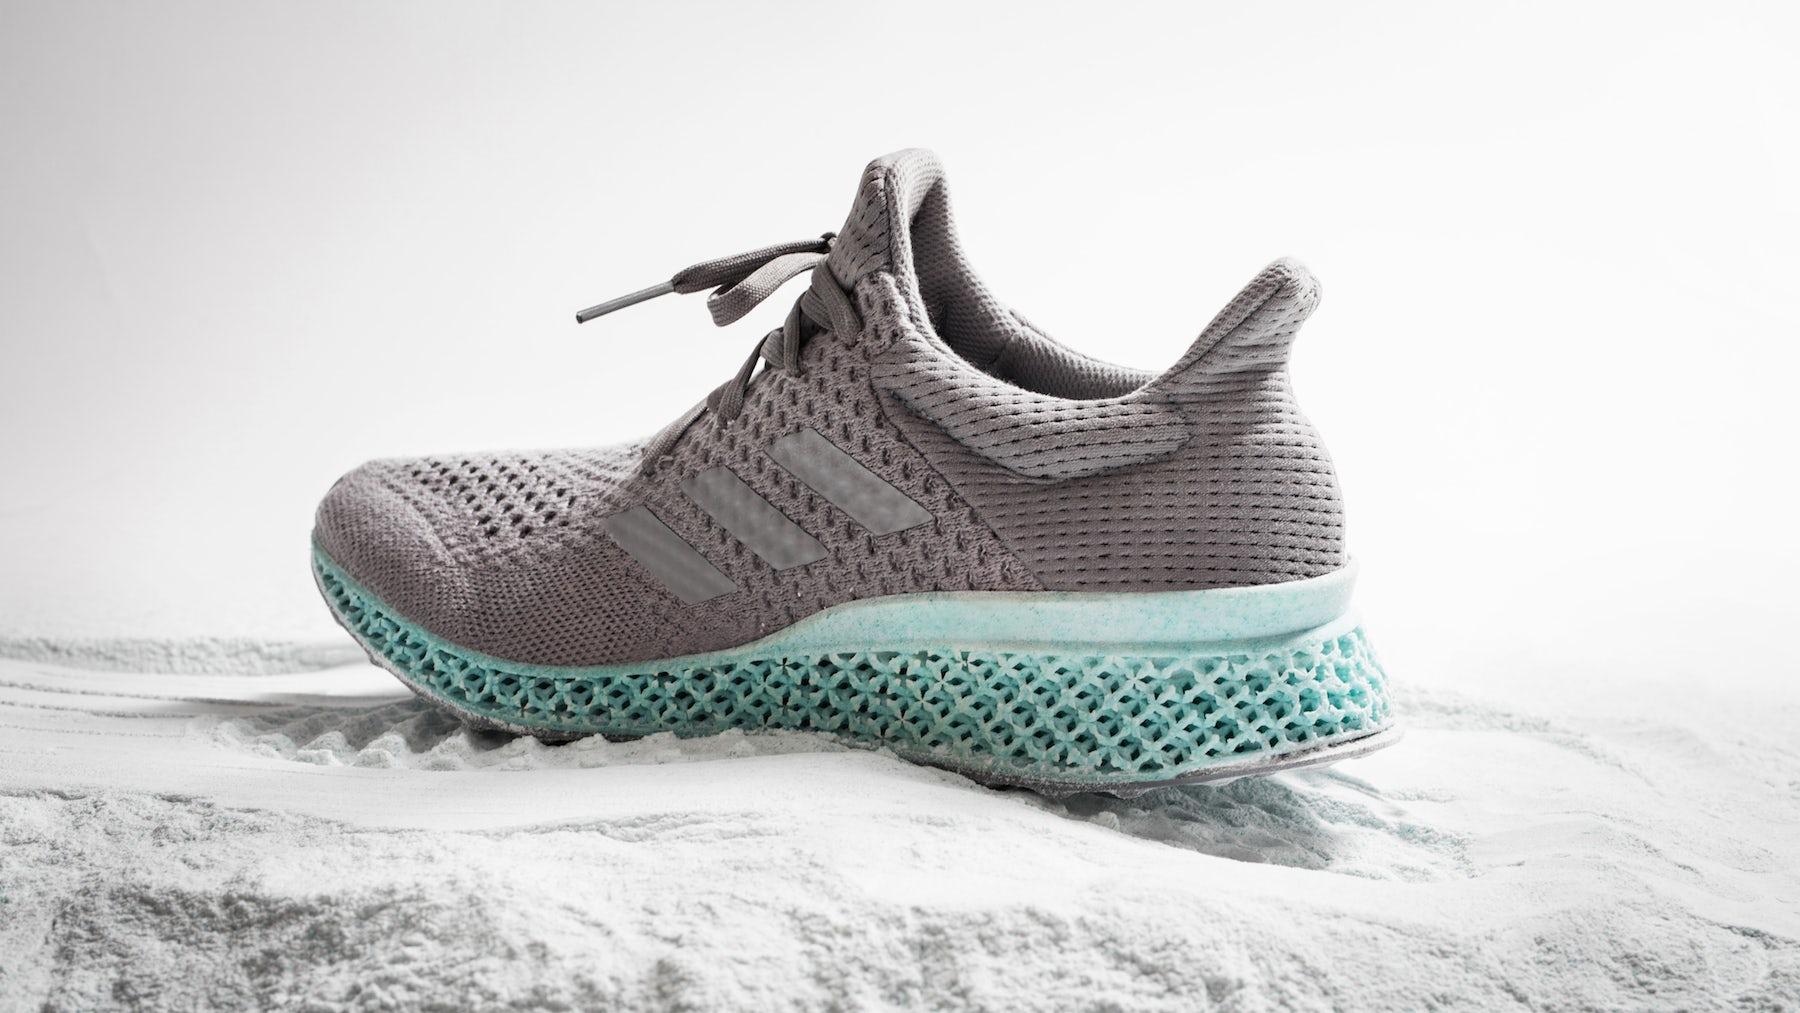 Adidas 3D-printed ocean plastic sneakers | Source: Adidas